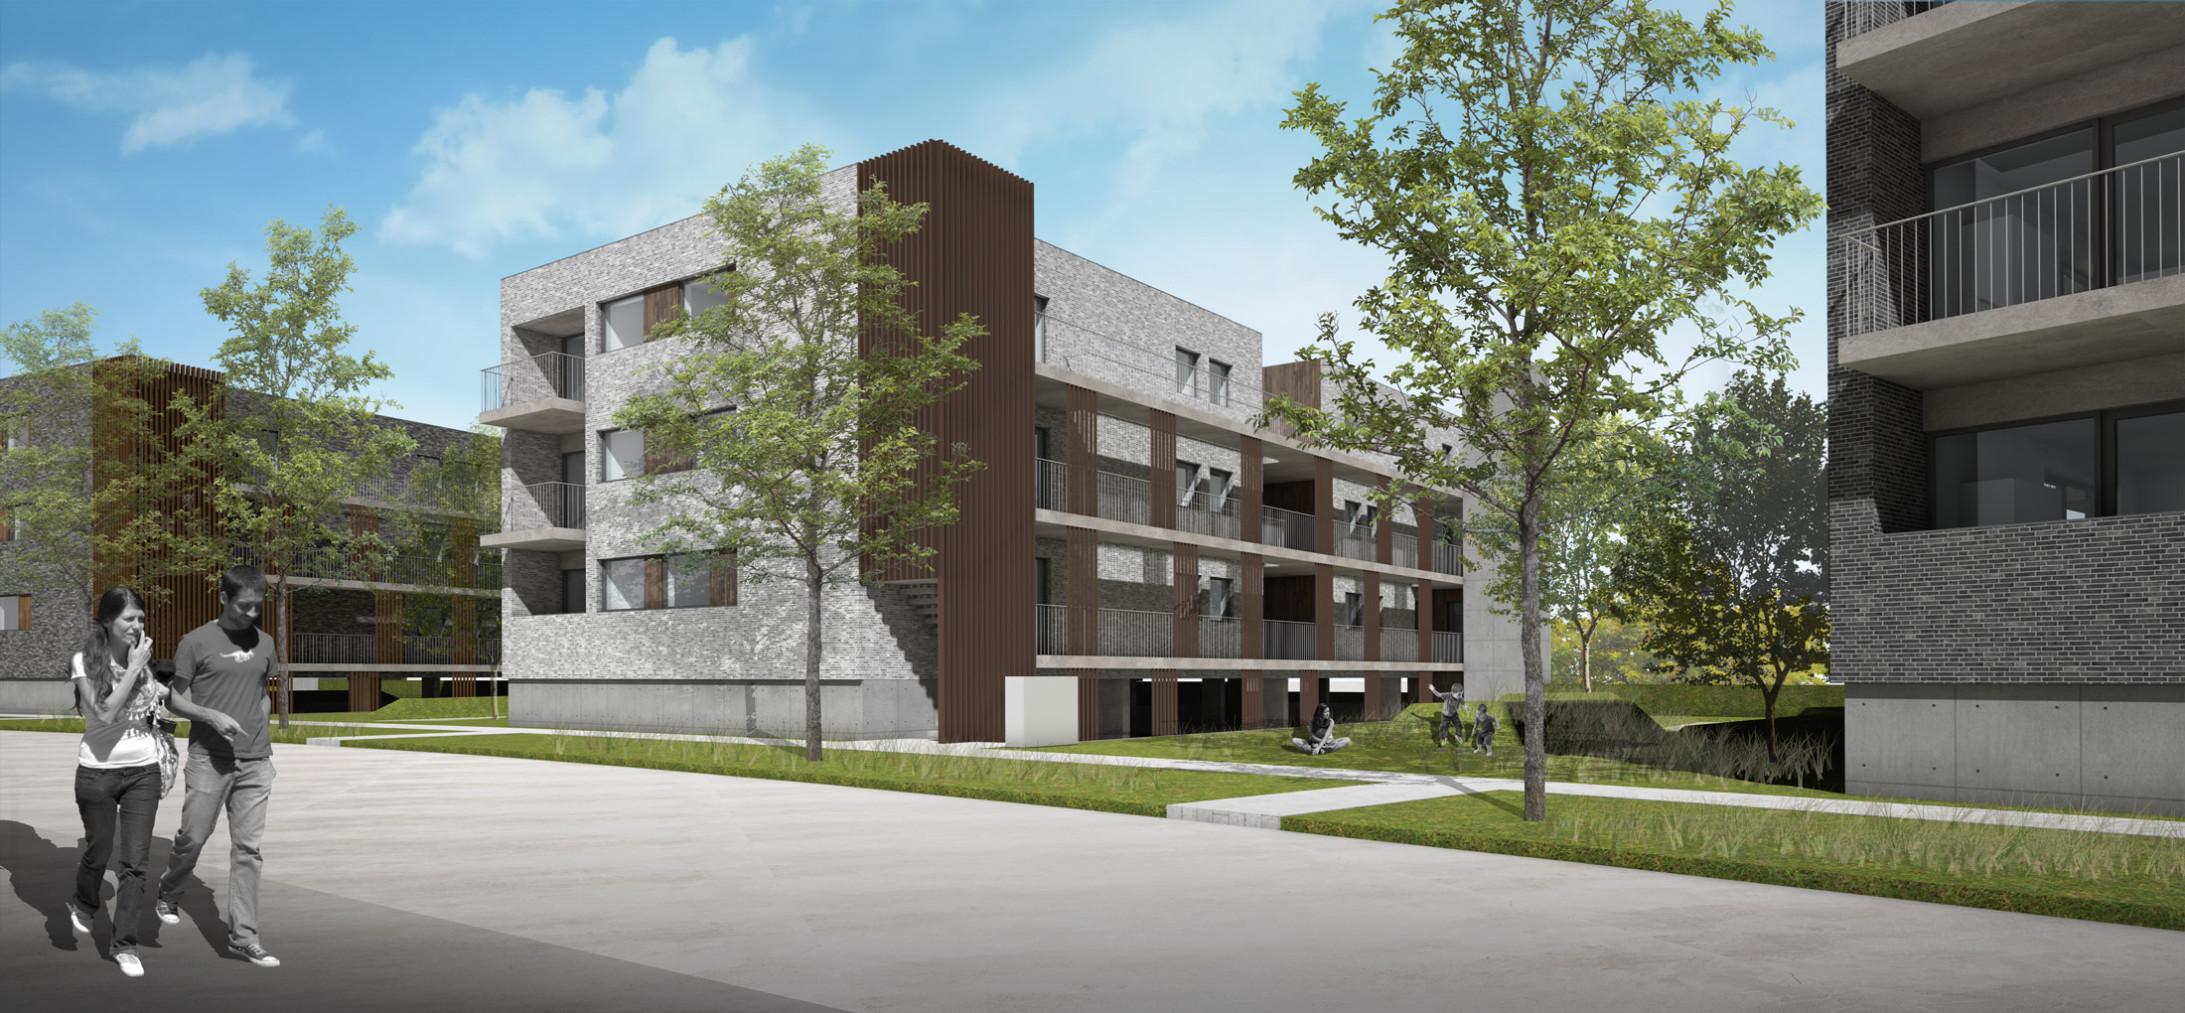 Sociale huisvesting4-Desselgem Vlaslaan-Claeys Architecten